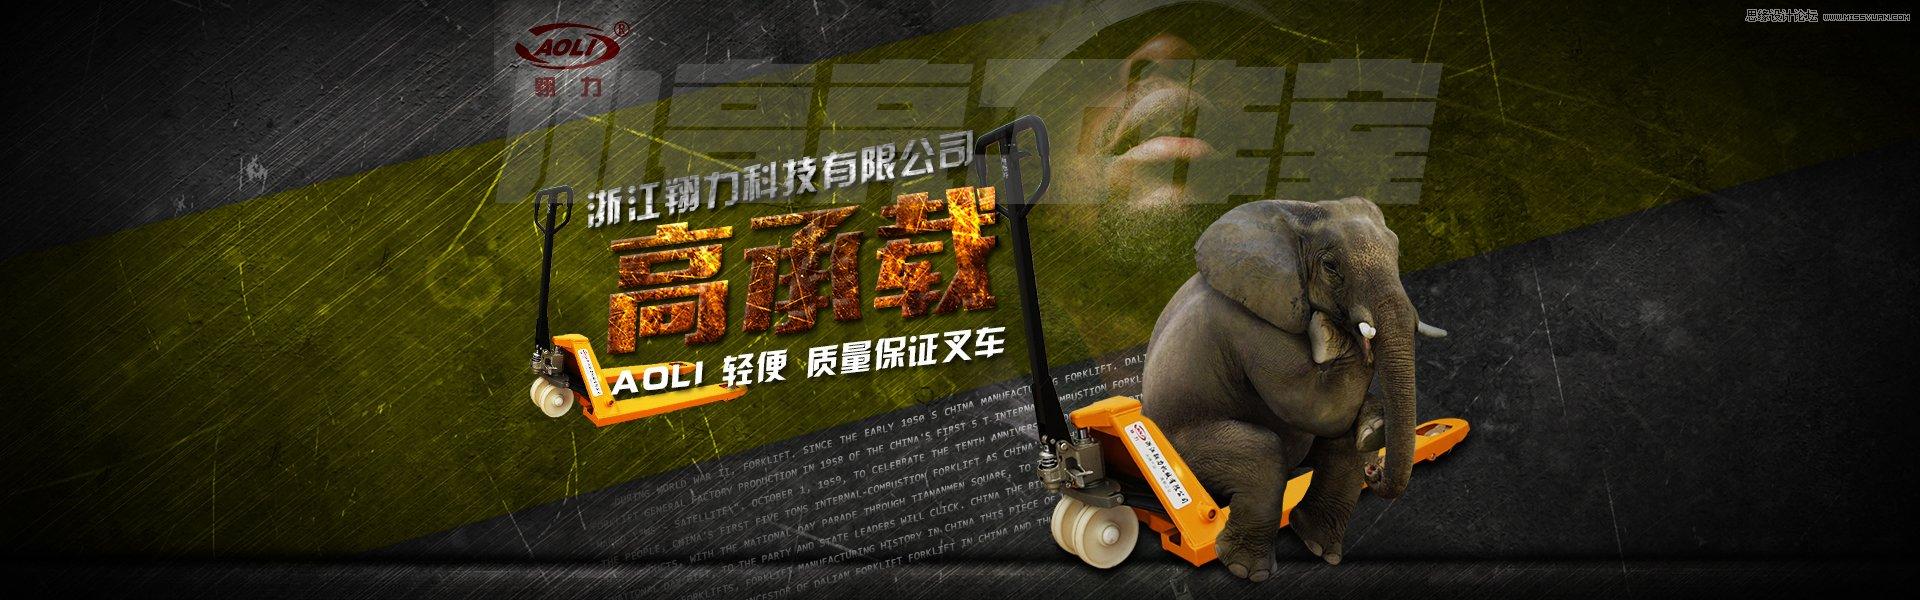 photoshop设计创意的产品宣传海报教程